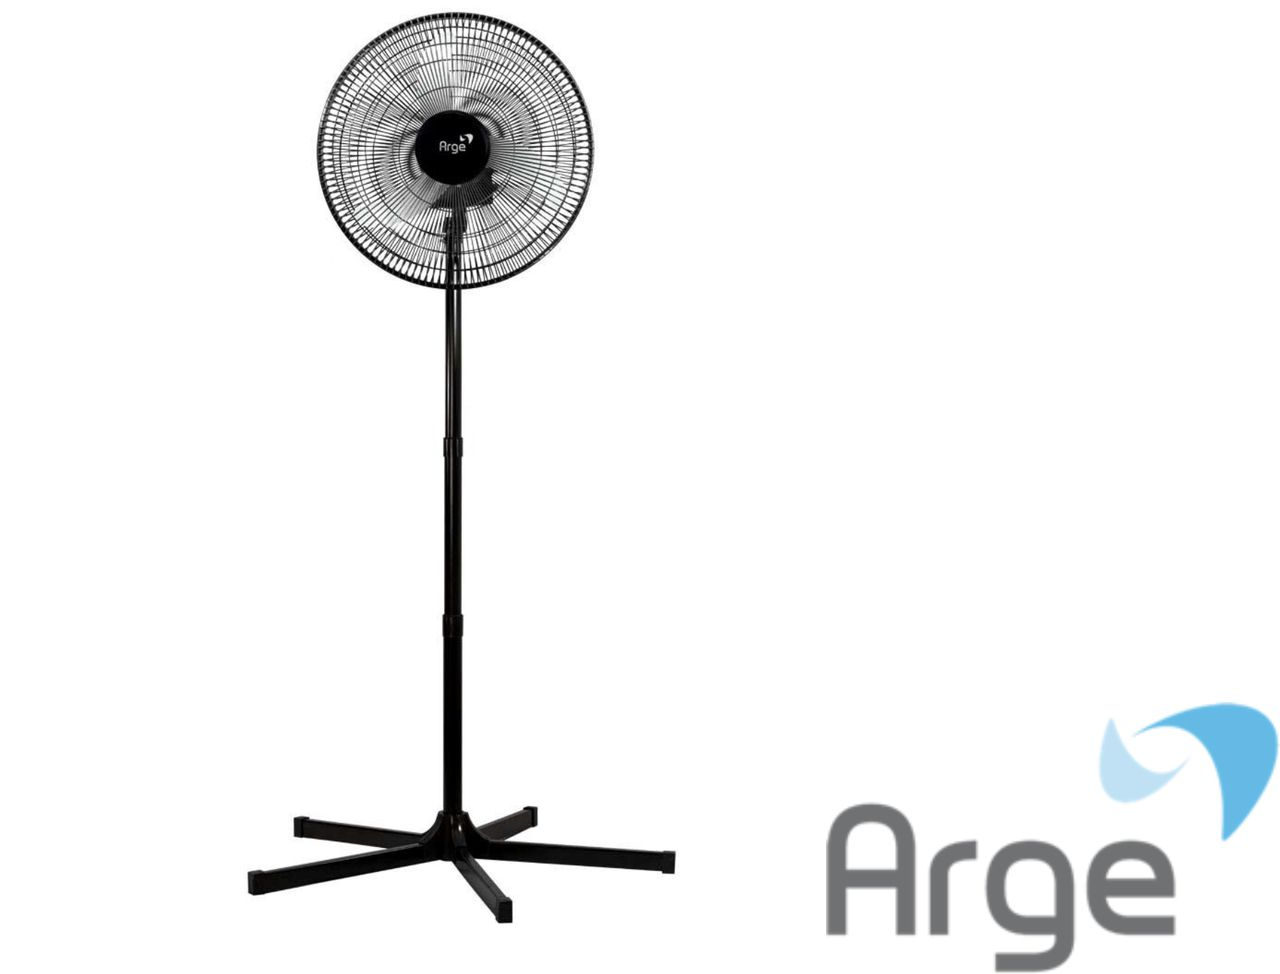 Ventilador coluna ARGE - 60CM TWISTER BIVOLT